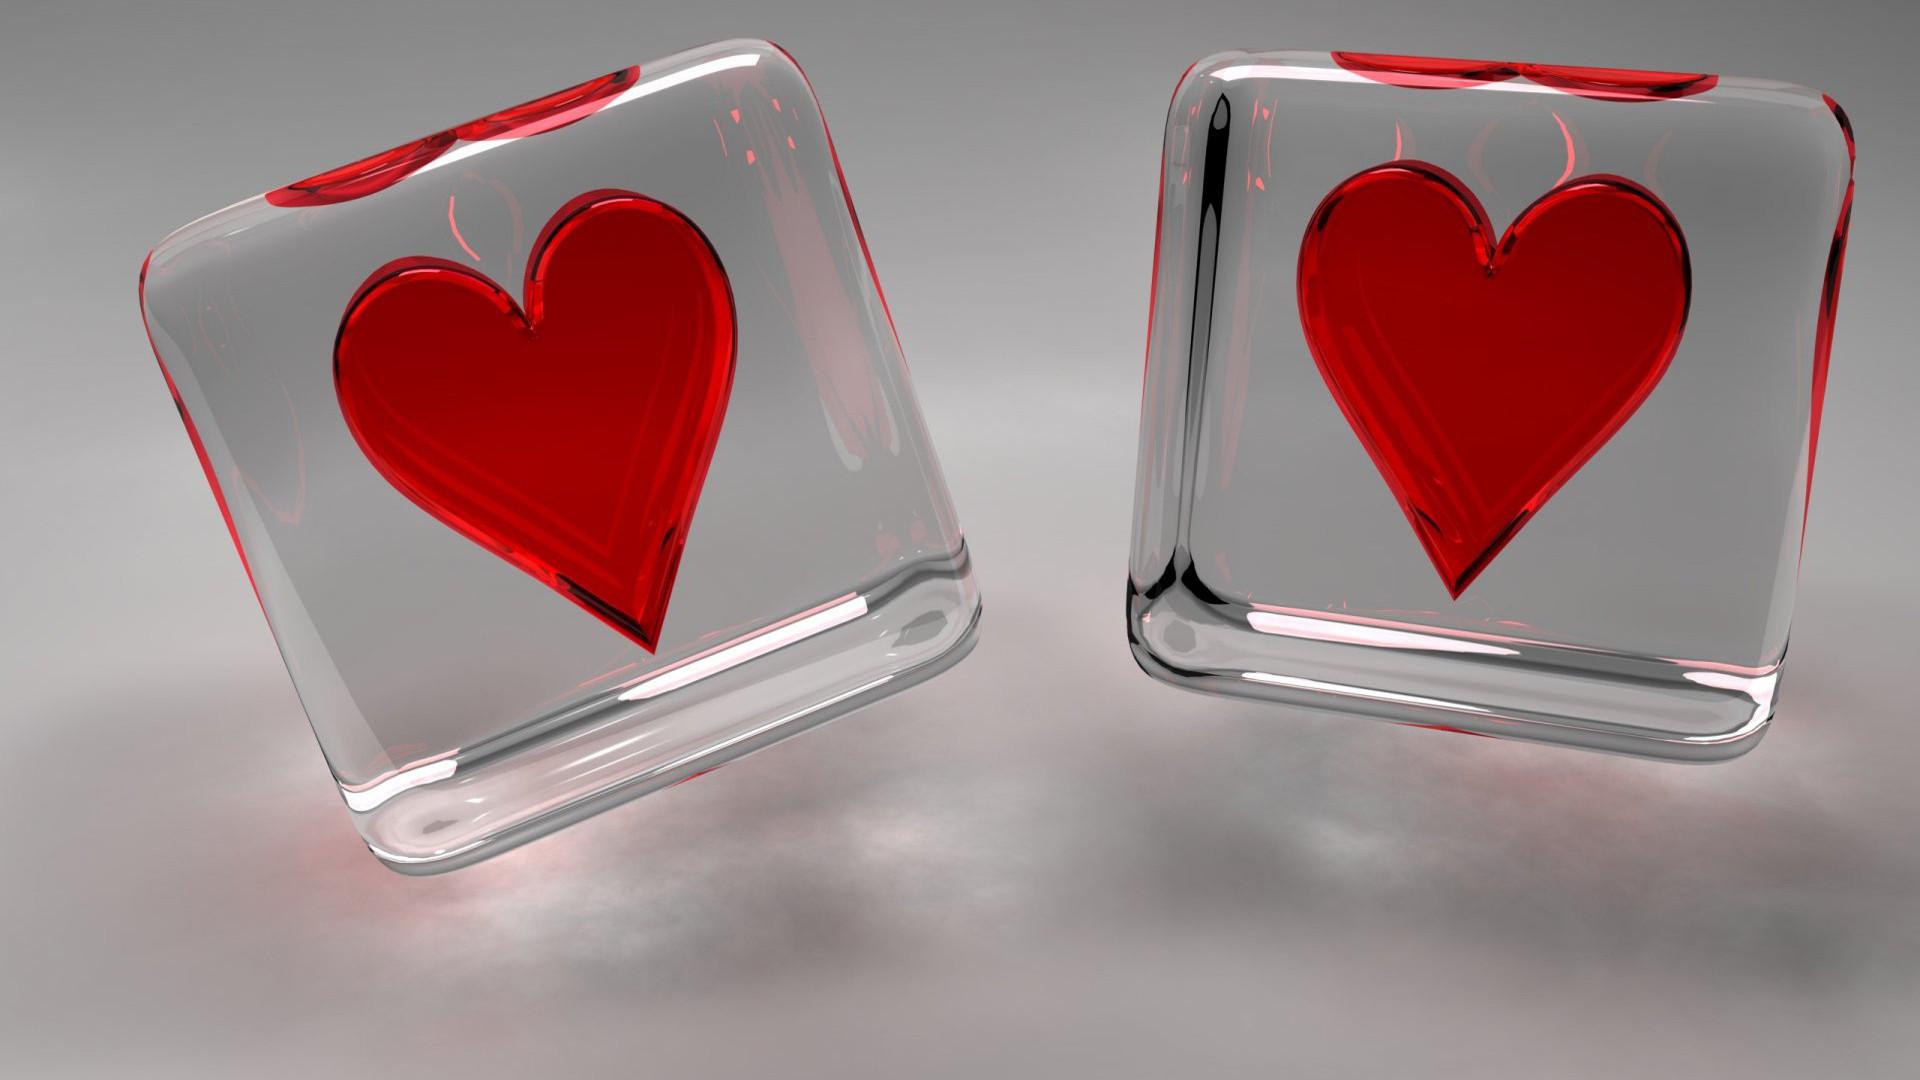 Hd Love Wallpaper 1920x1080 84 Images